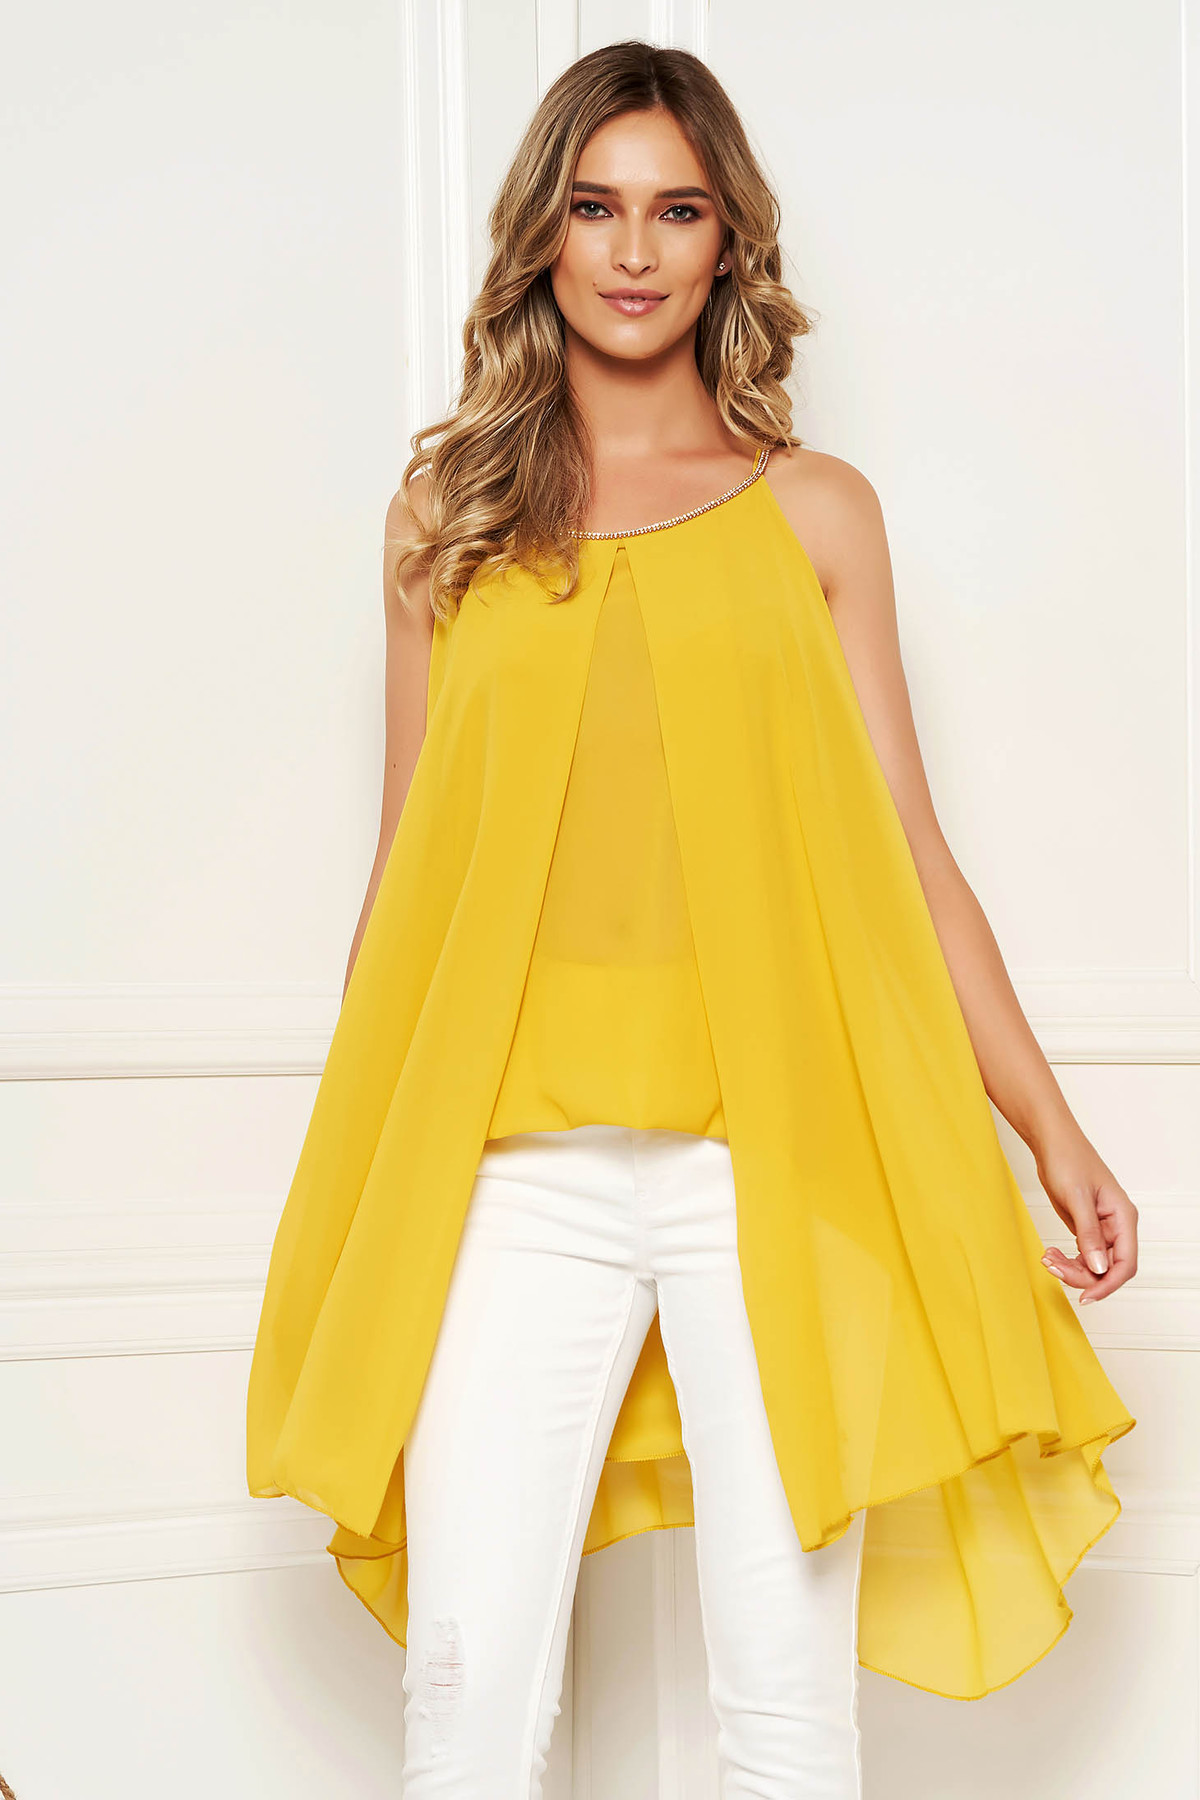 Bluza dama SunShine mustarie scurta de zi din voal suprapunere cu voal fara maneci